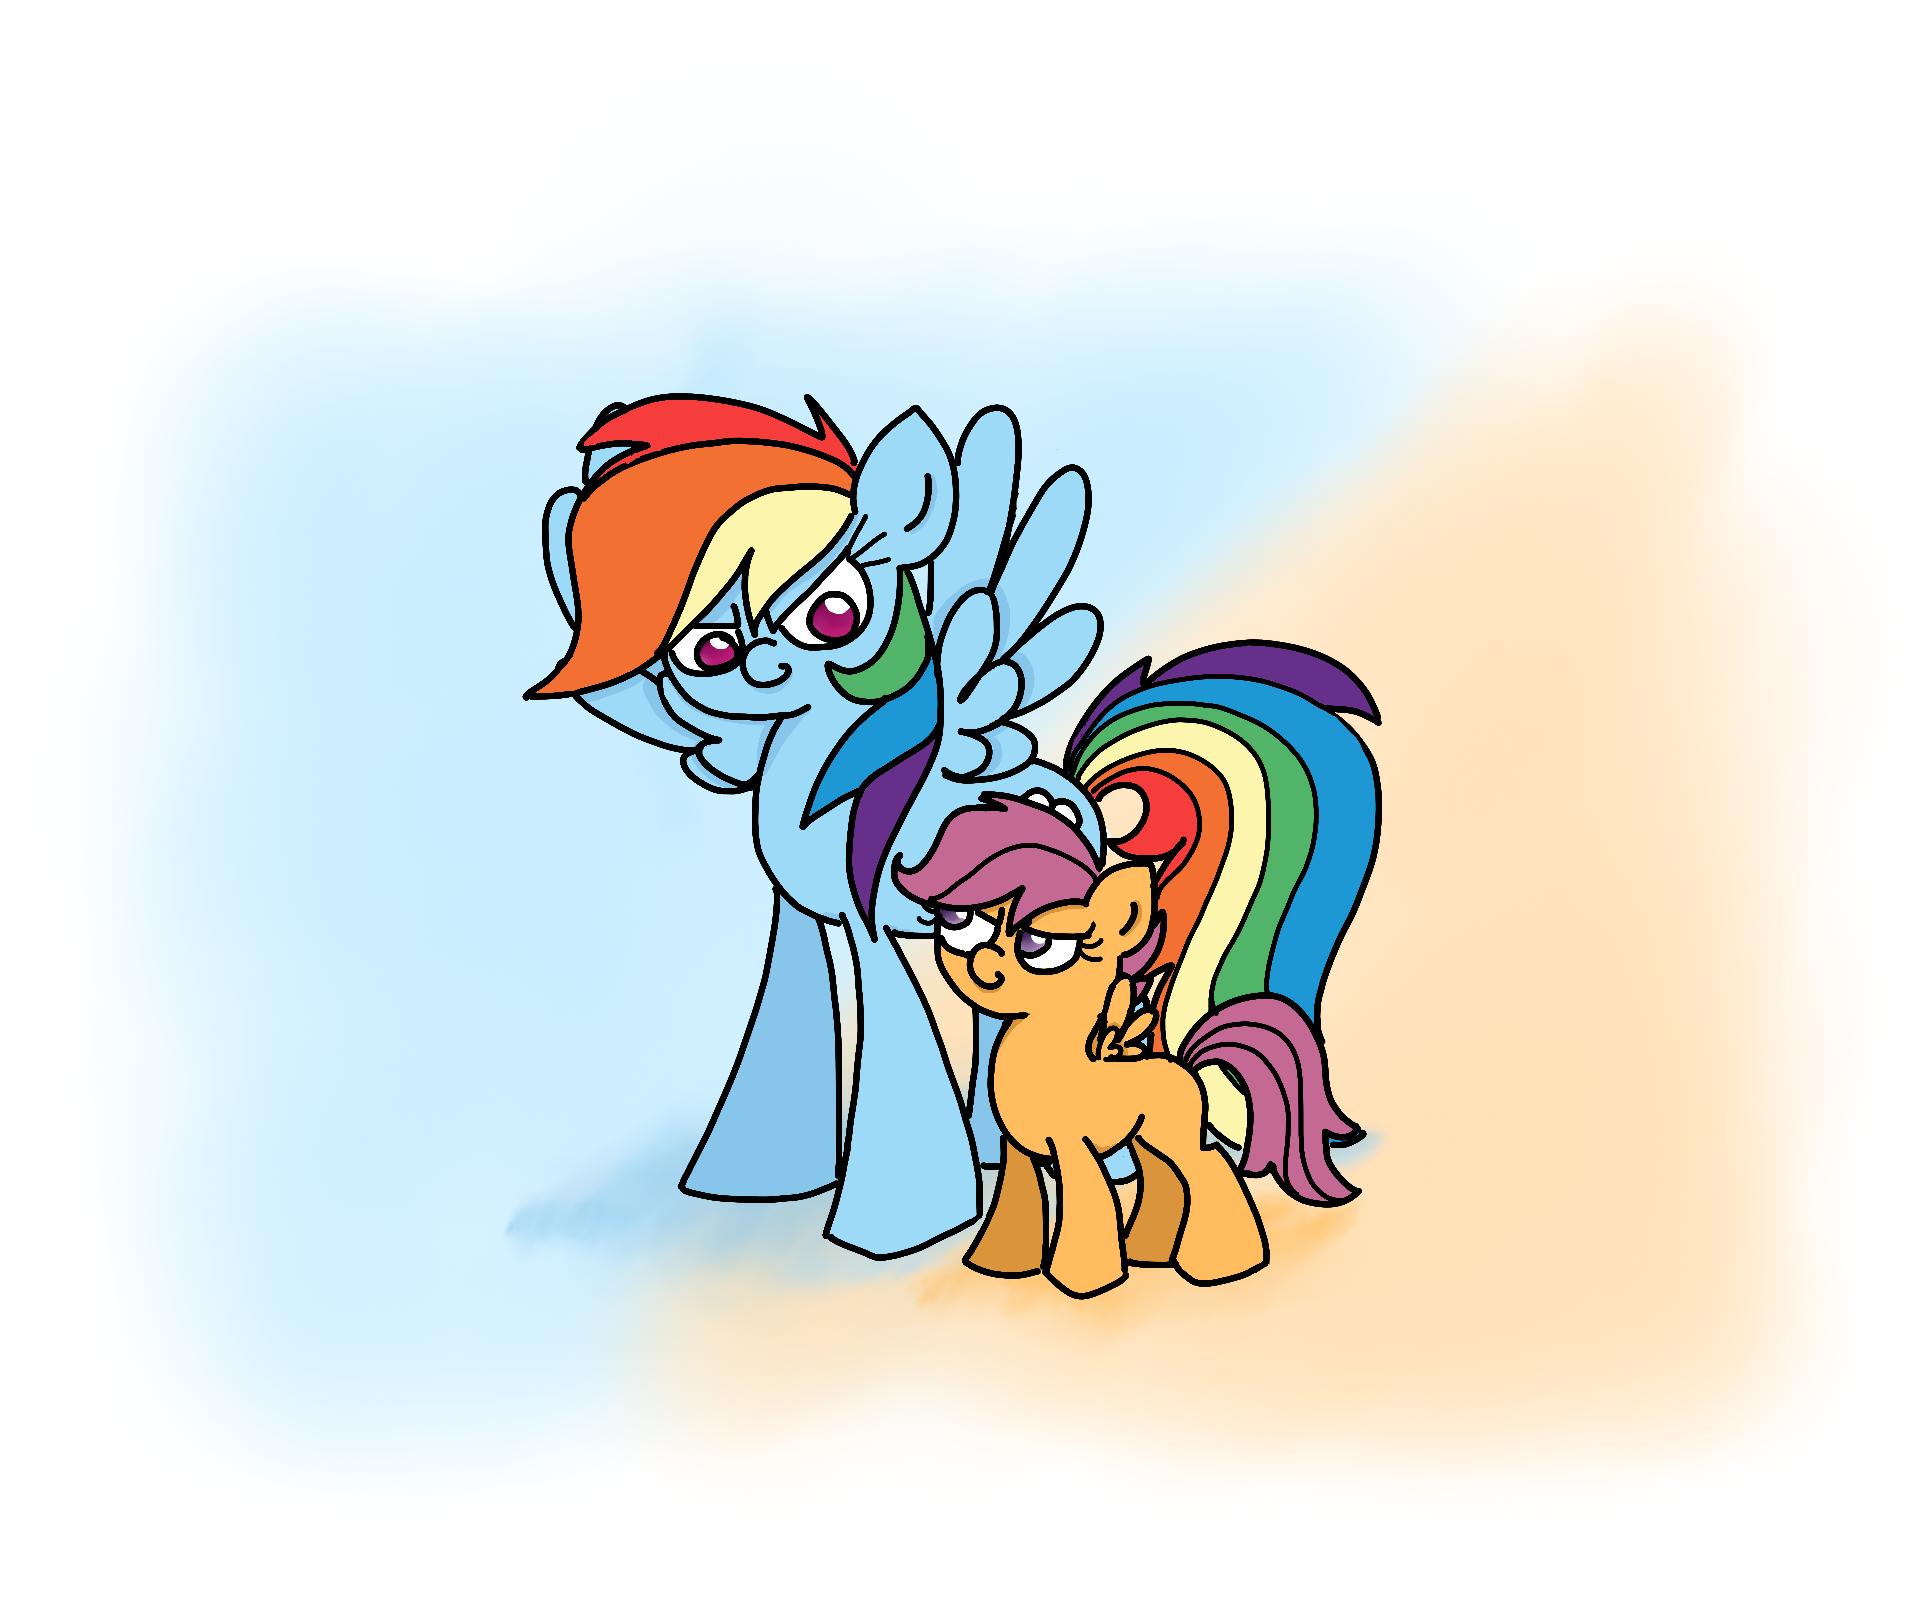 ponies+are+a+good+thing+to+draw+_54ca6f91225c5f704dd6f27b568acbd4.png